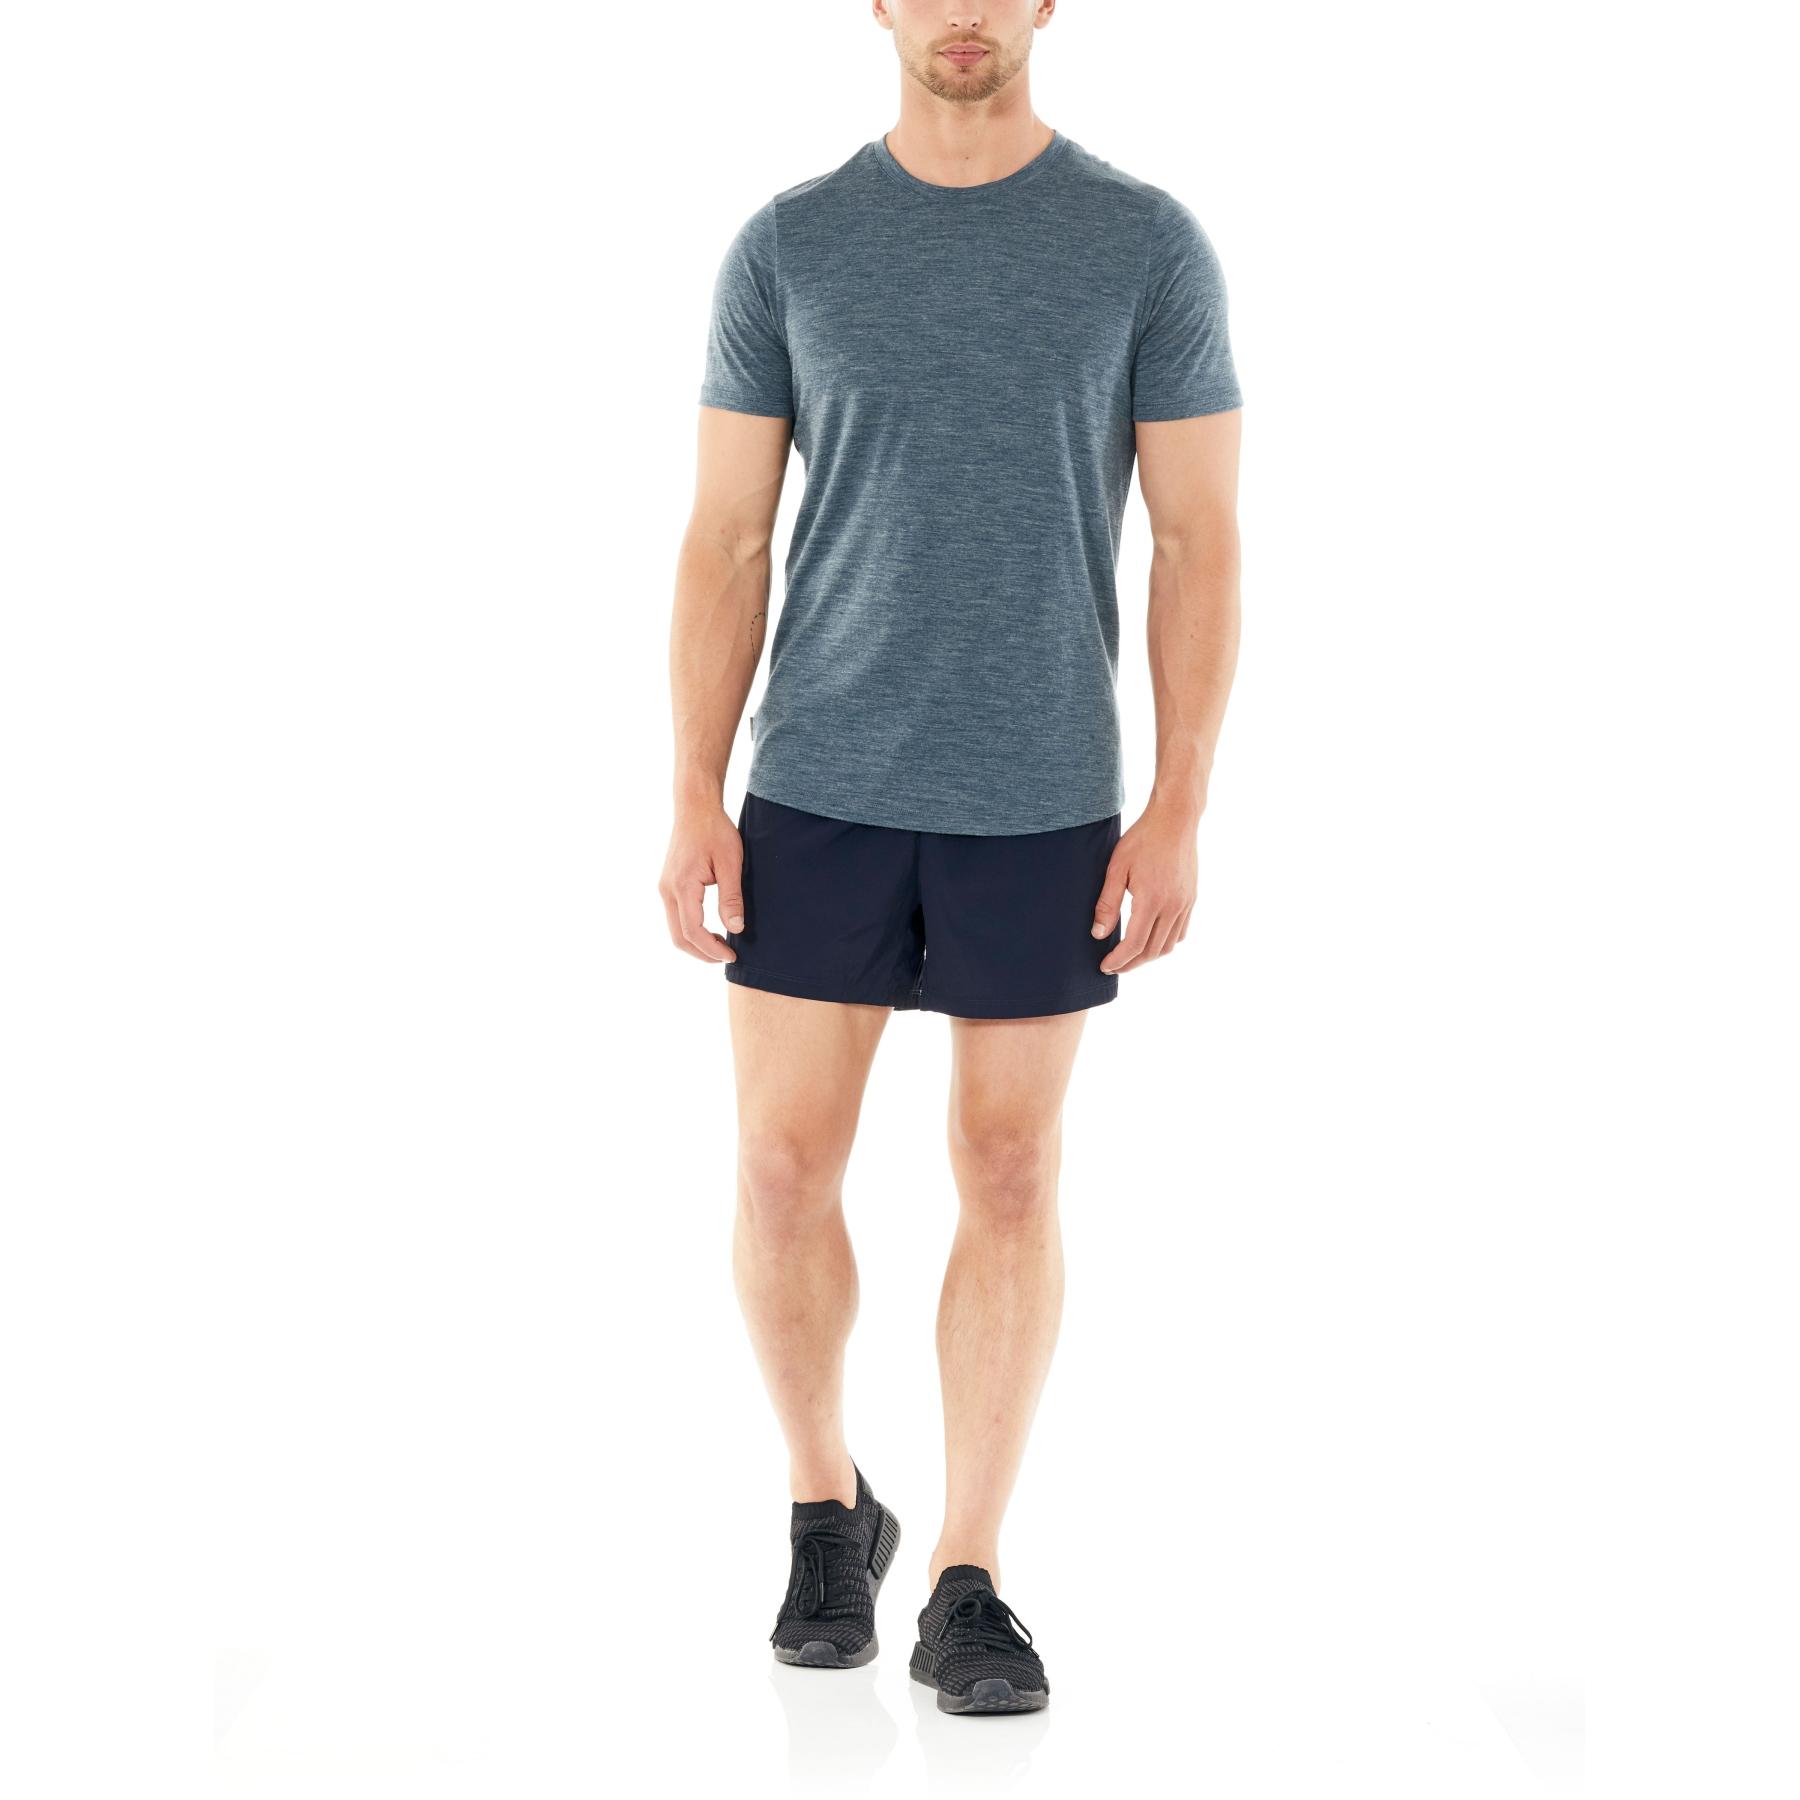 Bild von Icebreaker Impulse Running Herren Shorts - Midnight Navy